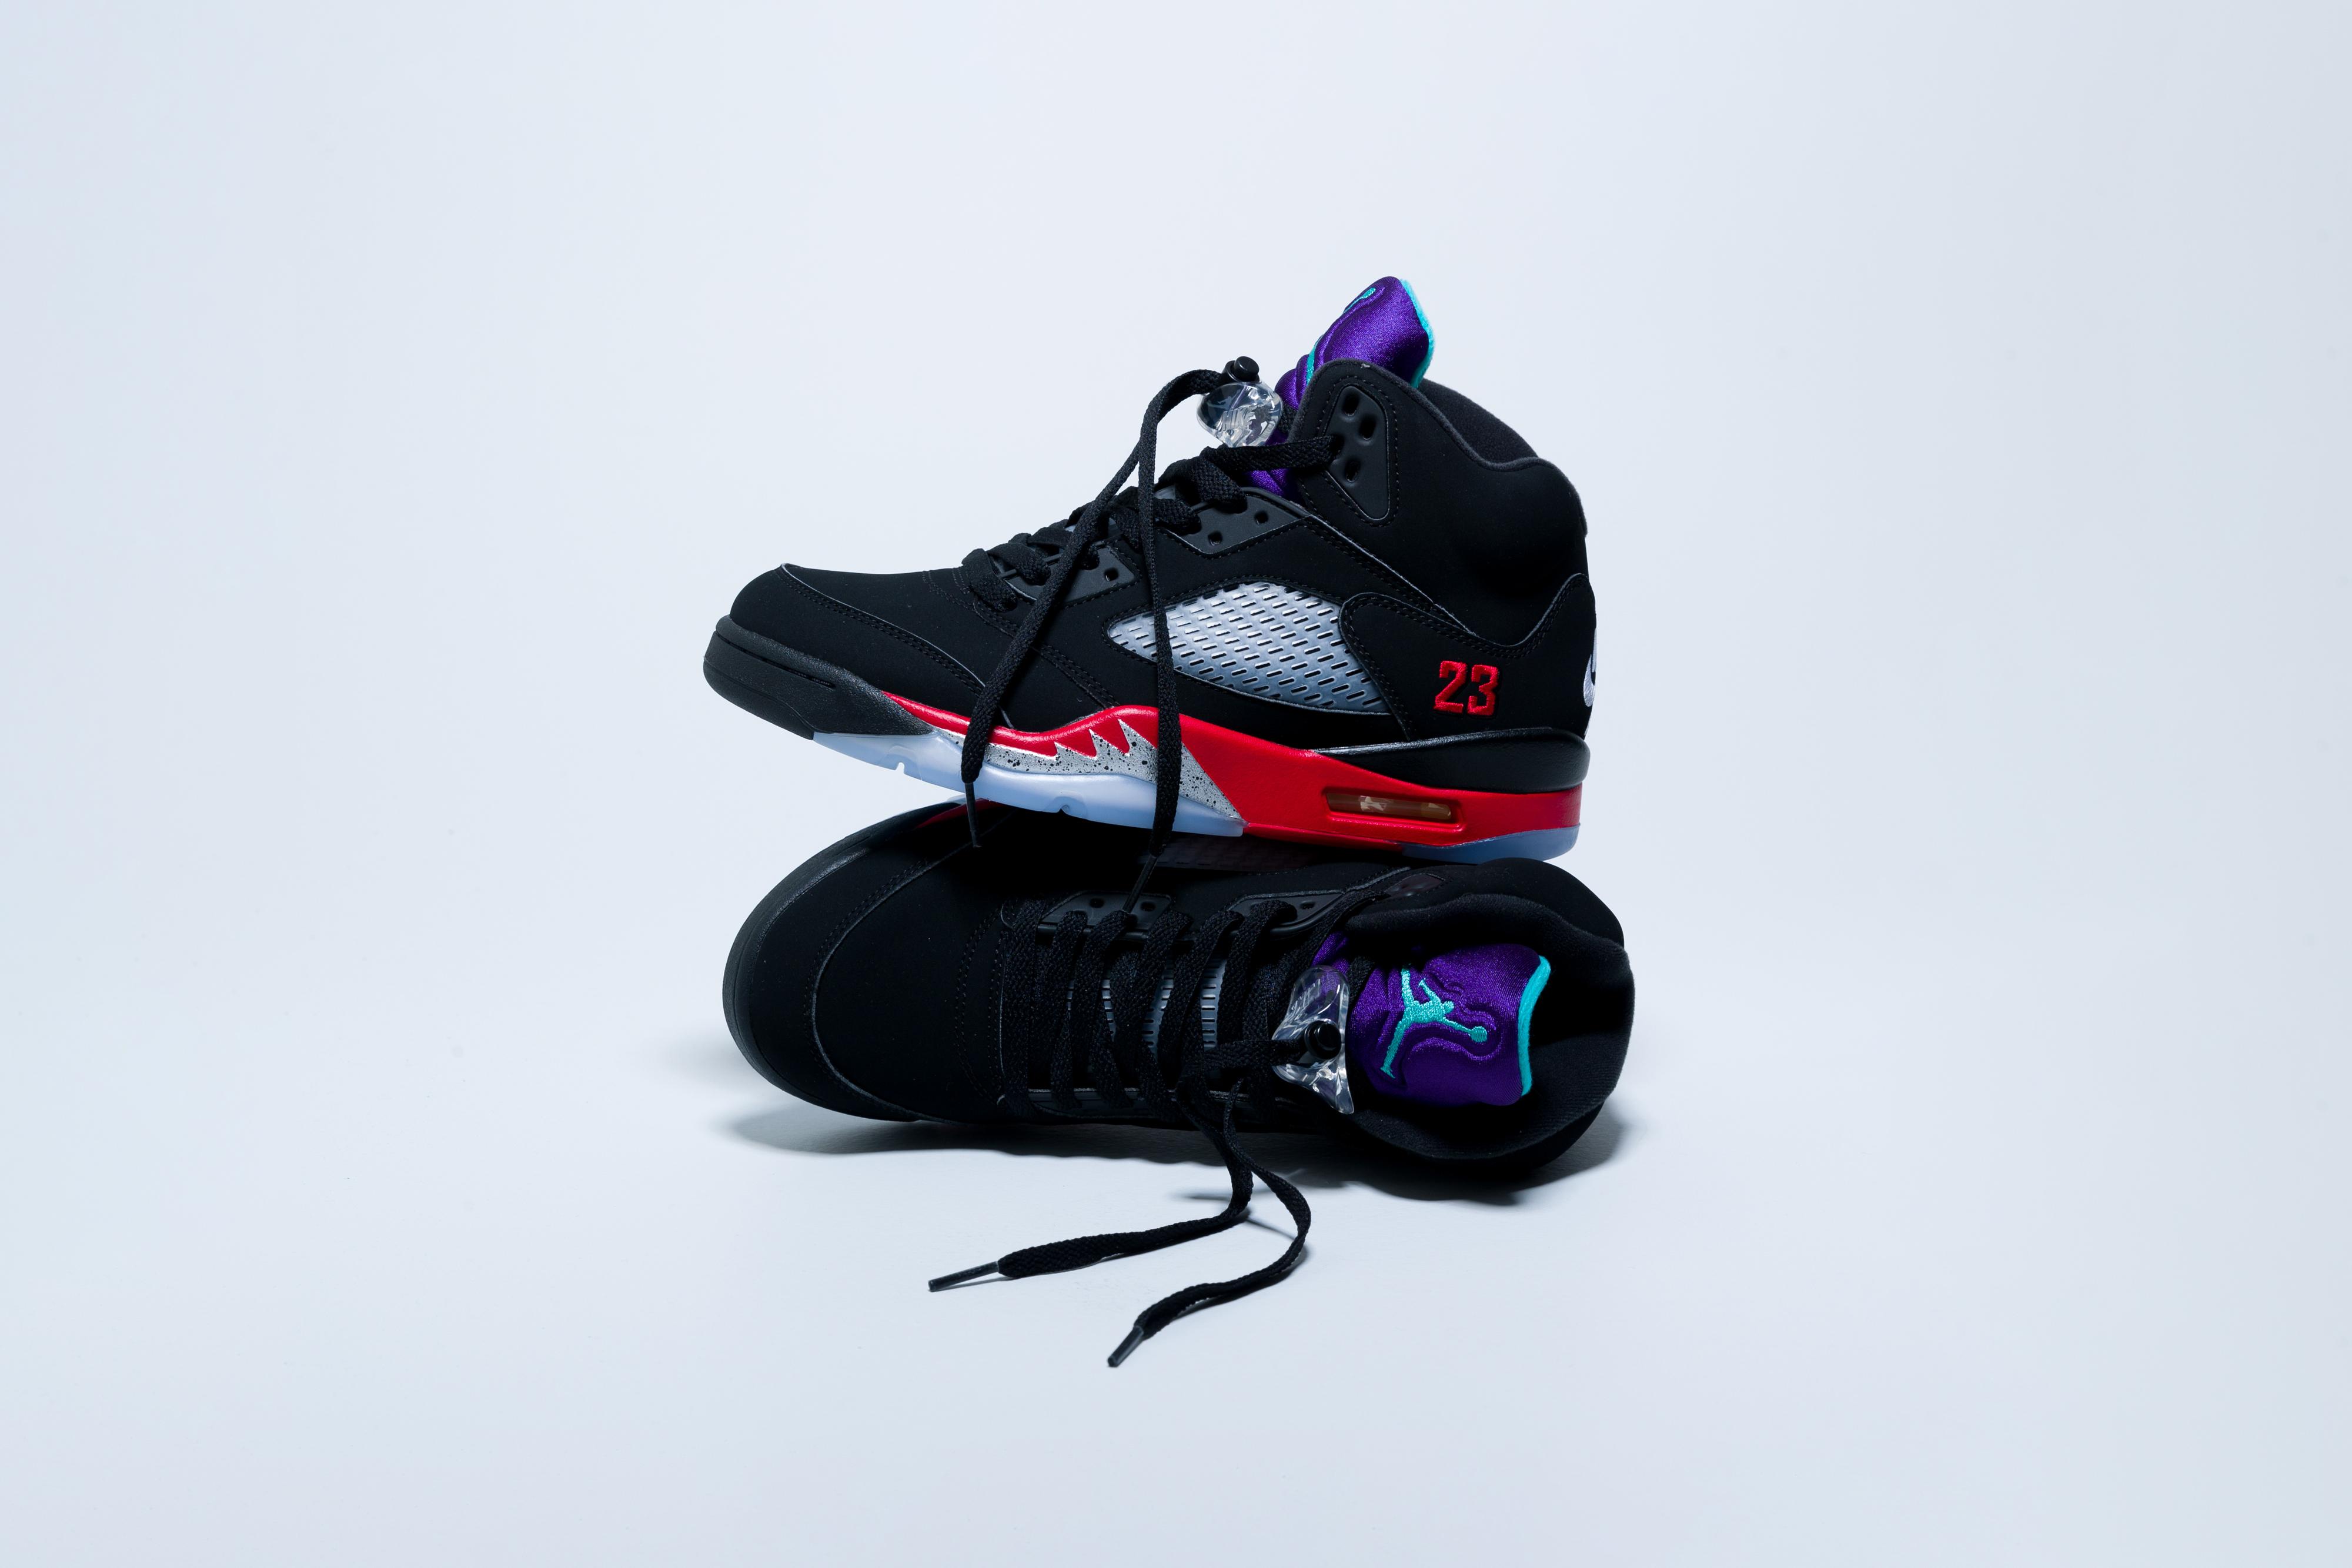 Jordan - Air Jordan 5 Retro - Black/Fire Red-Grape Ice-New Emerald - Up There